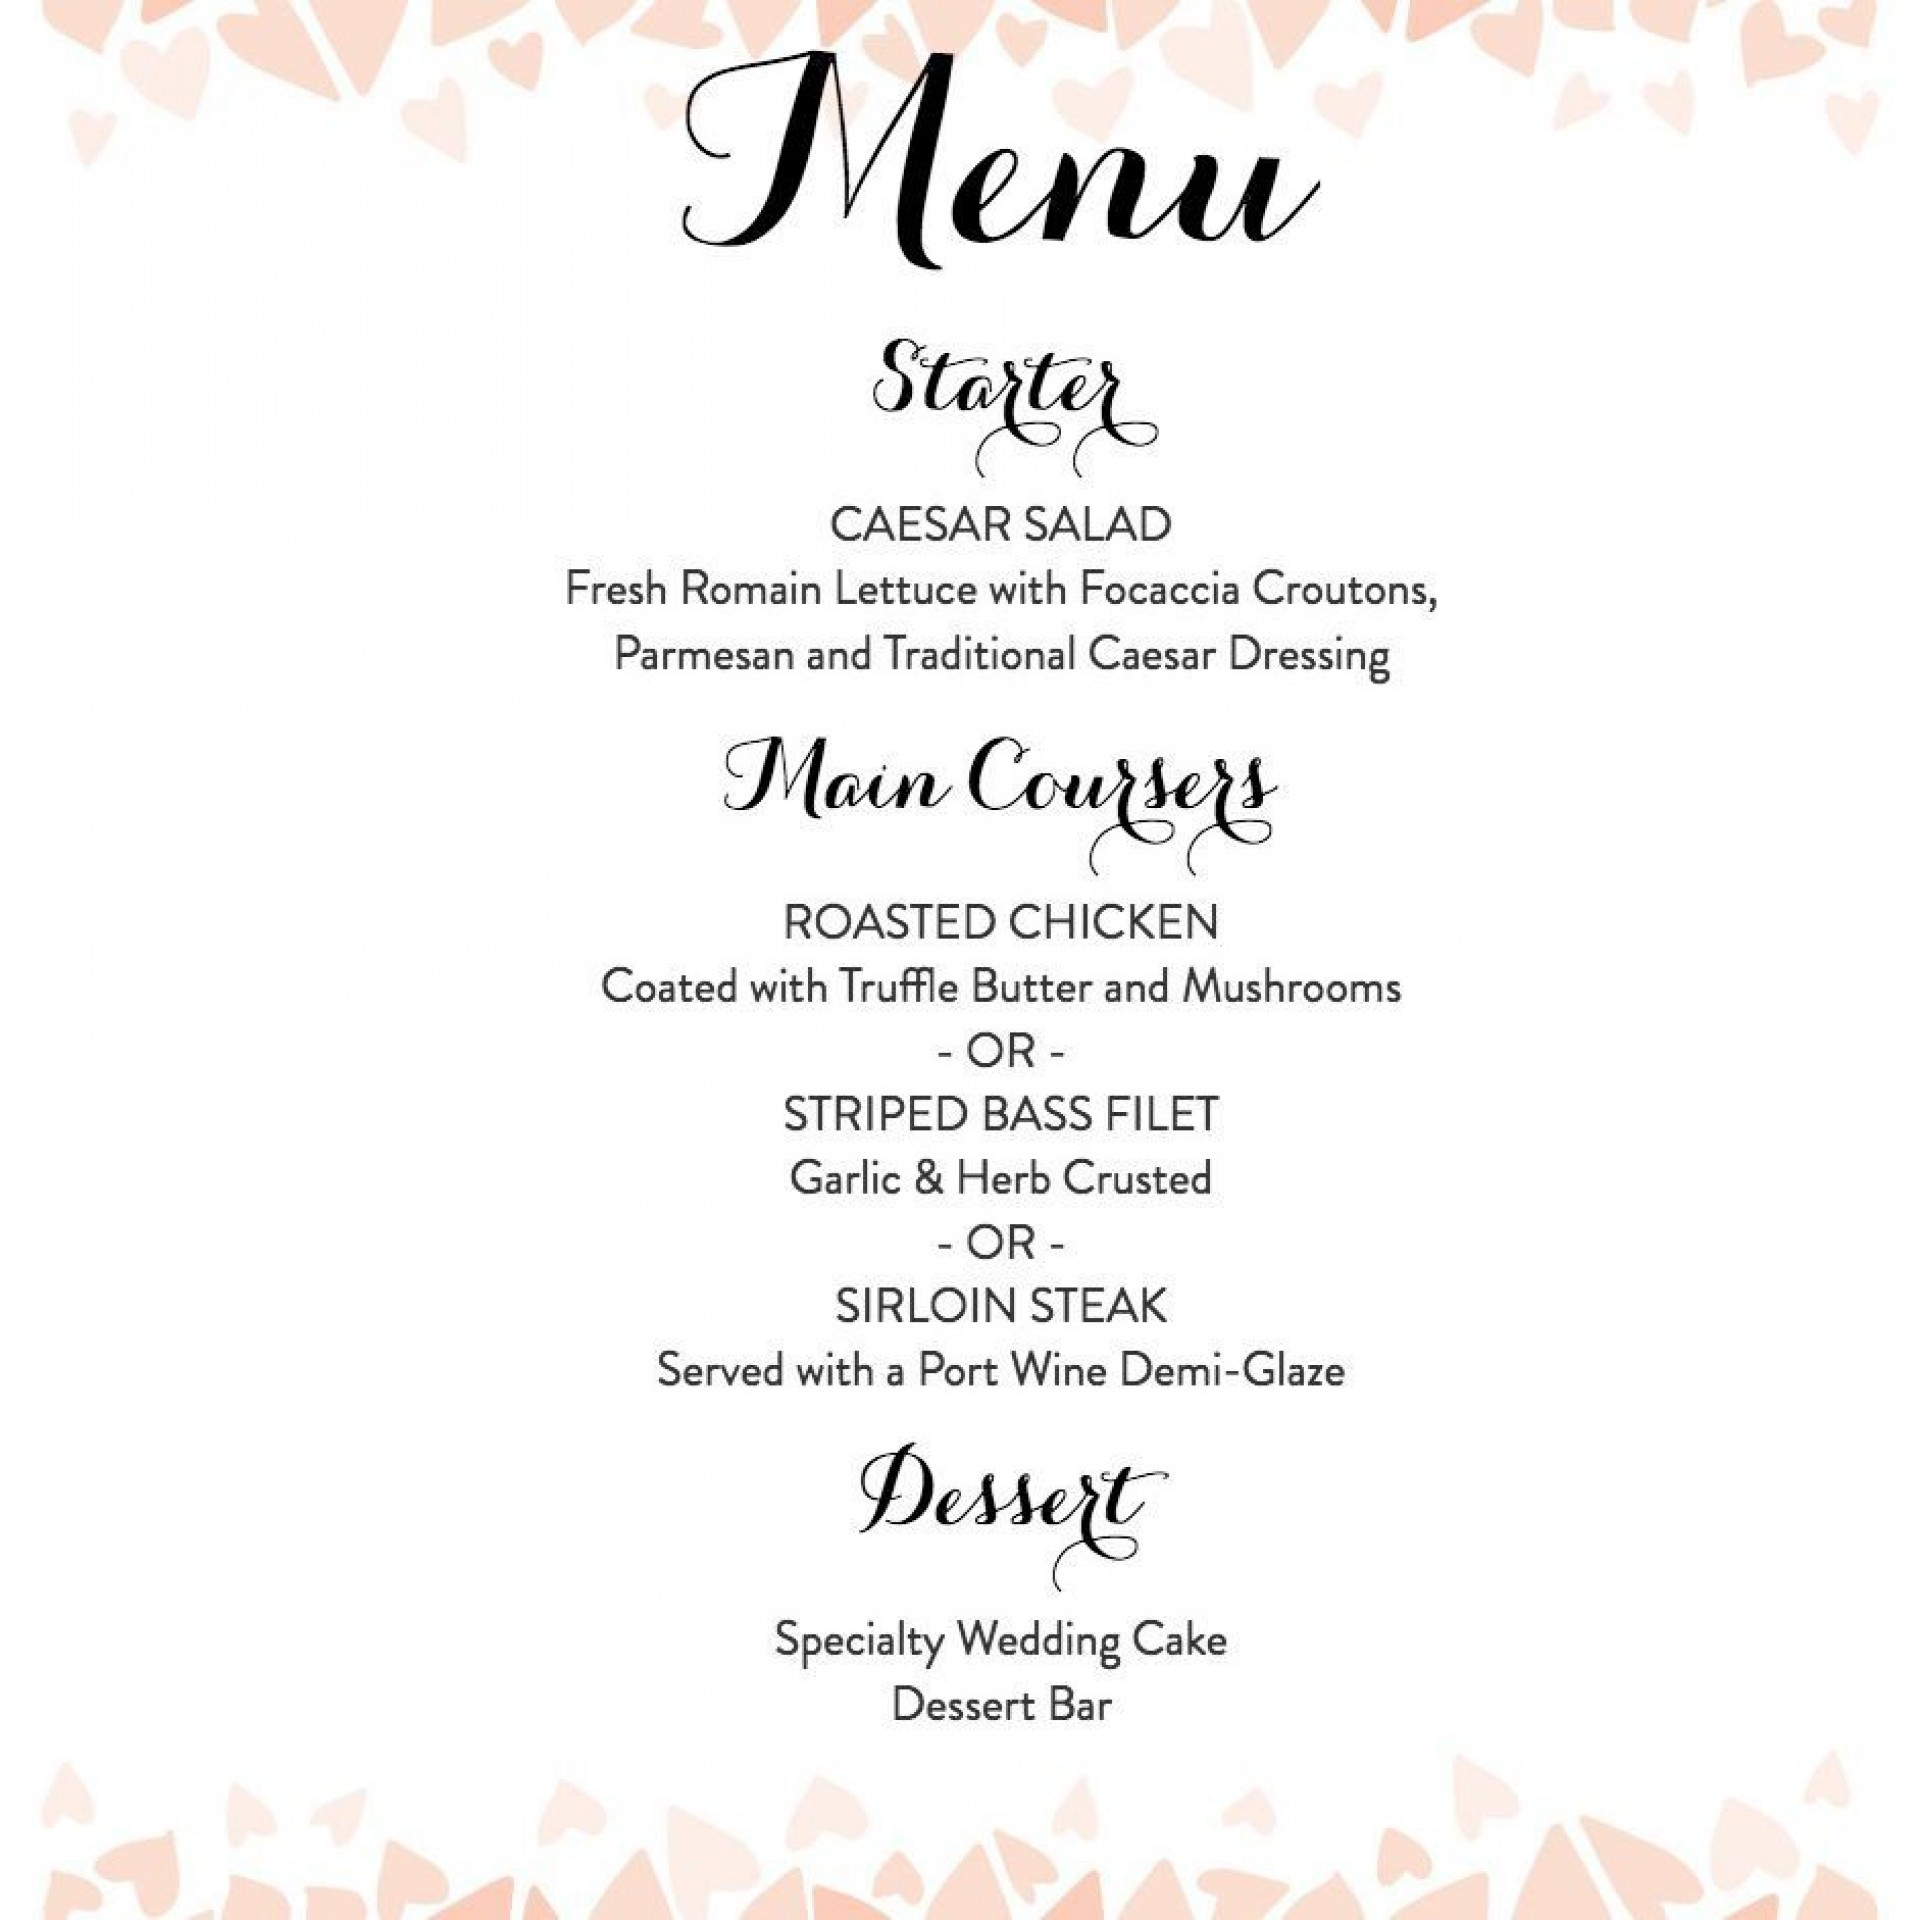 007 Remarkable Diy Wedding Menu Template Highest Quality  Free Card1920